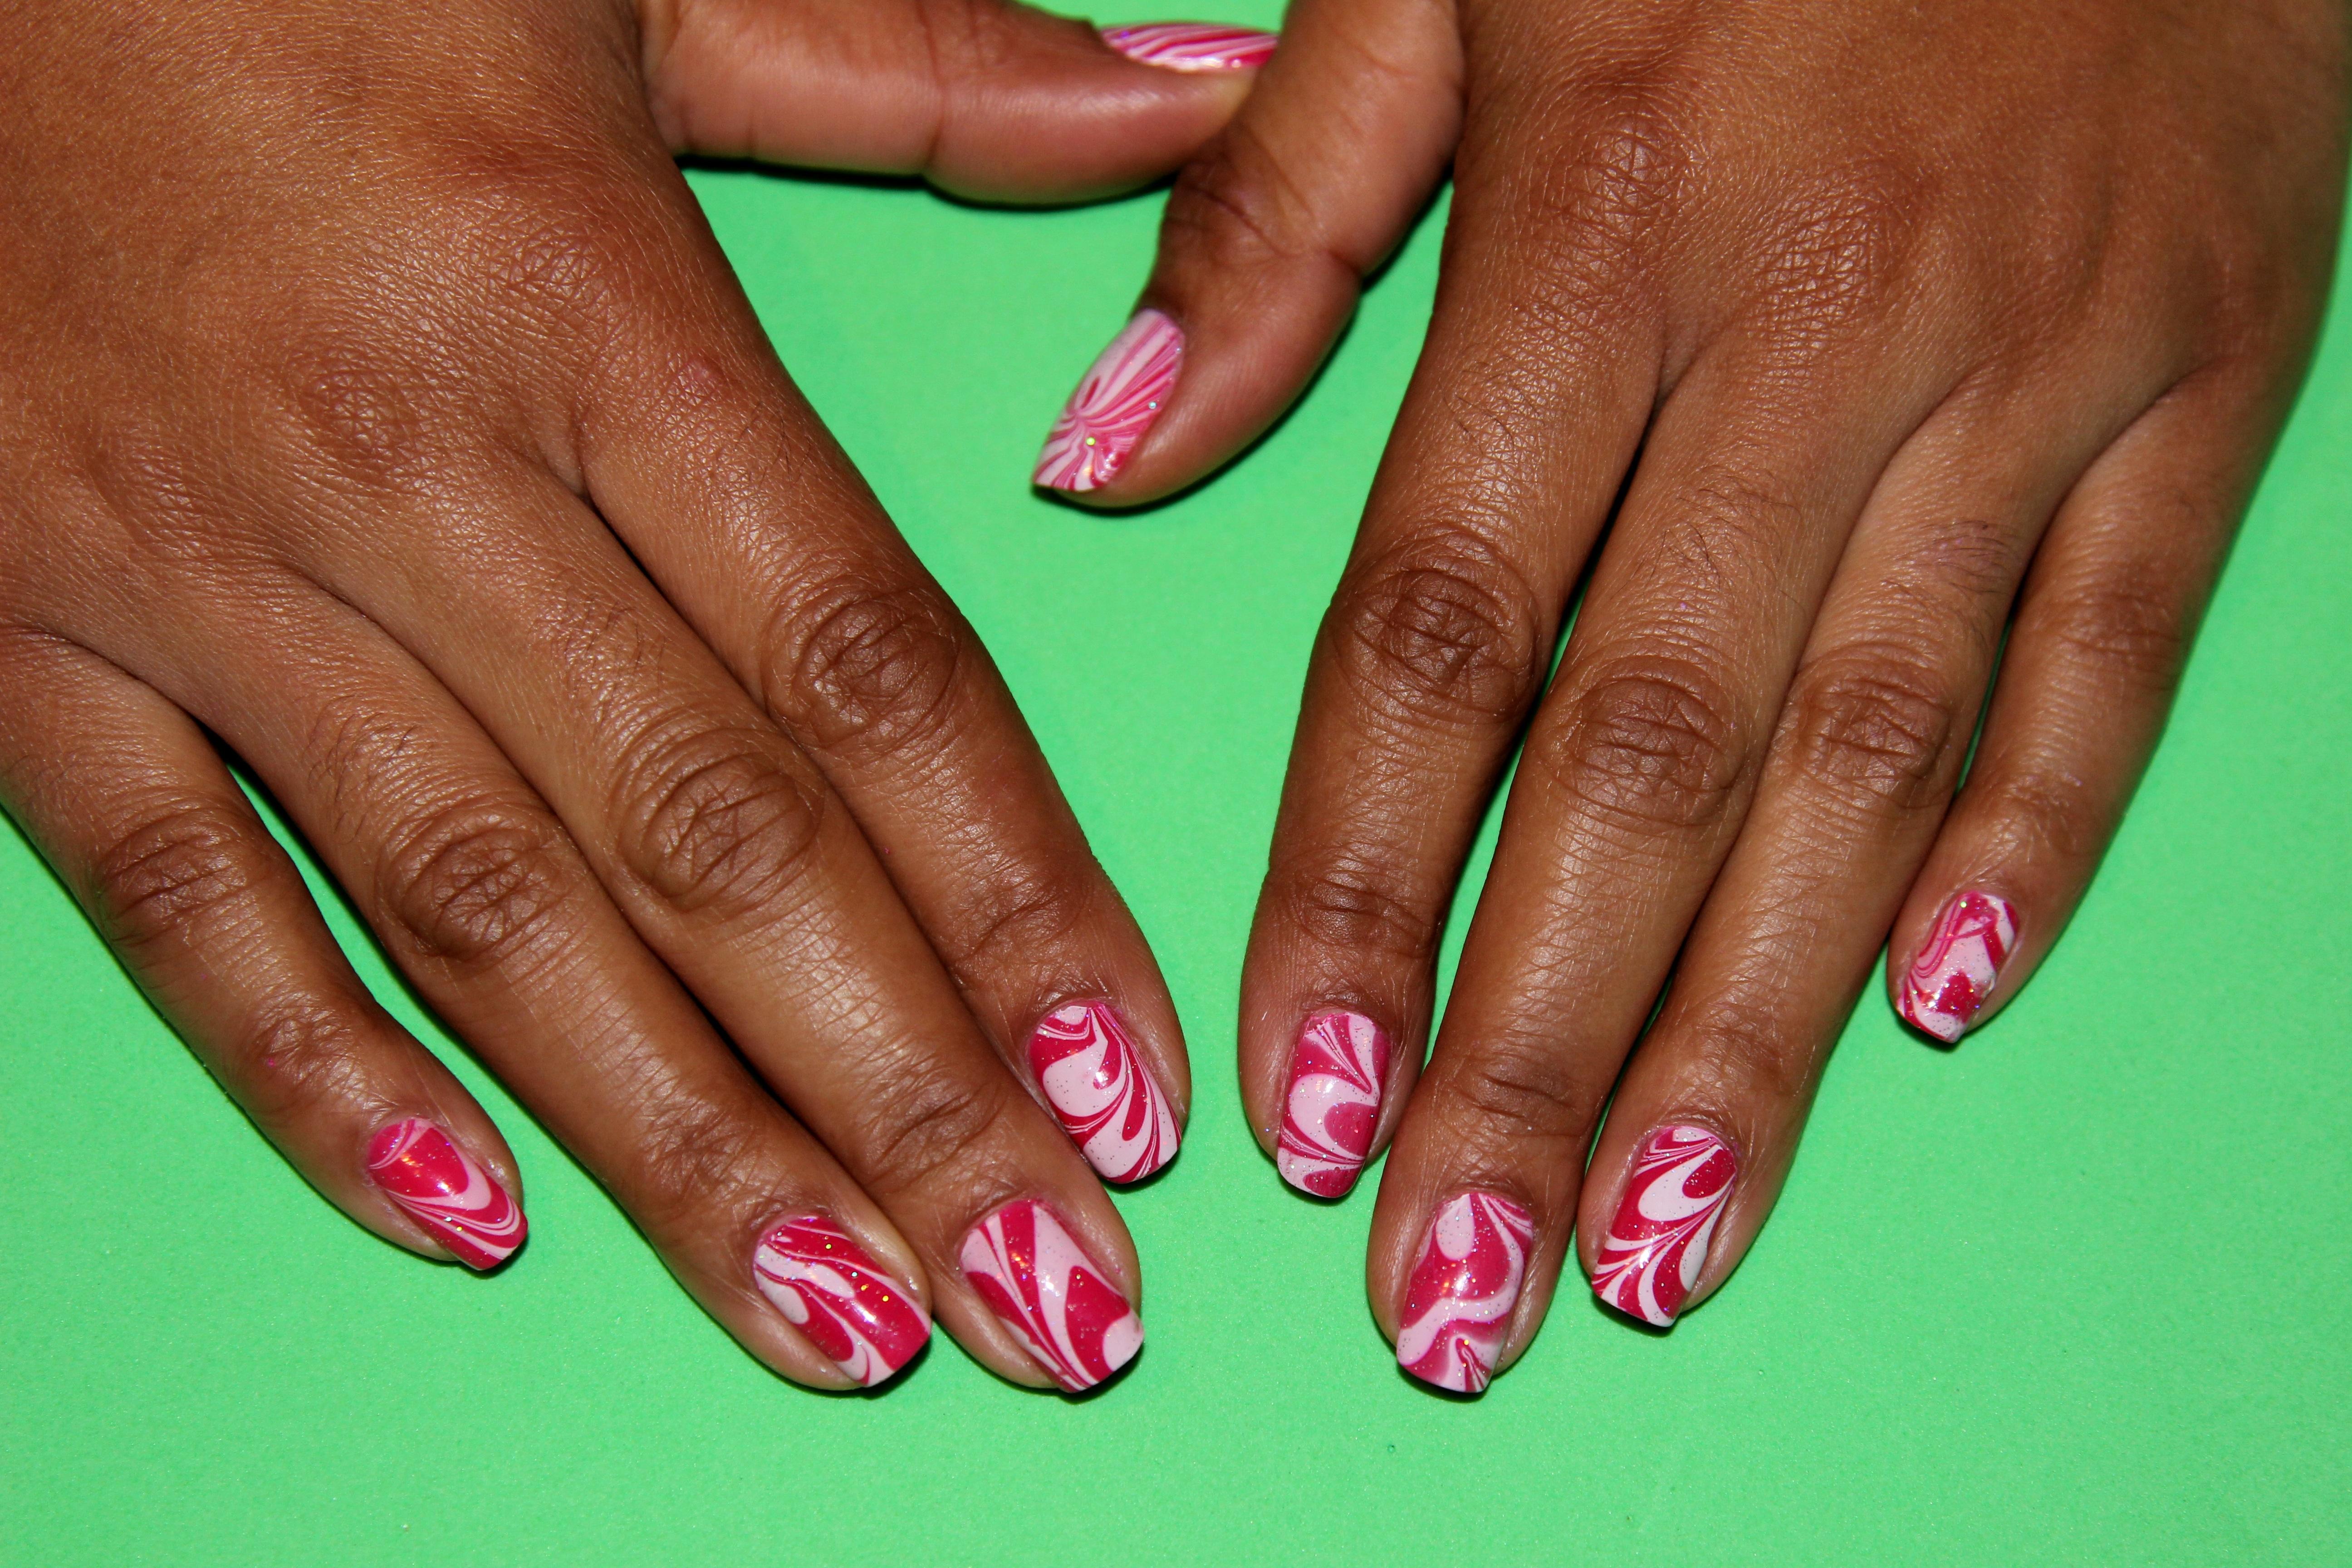 Fotos gratis : dedo, Moda, vistoso, uña, manicura, esmalte de uñas ...